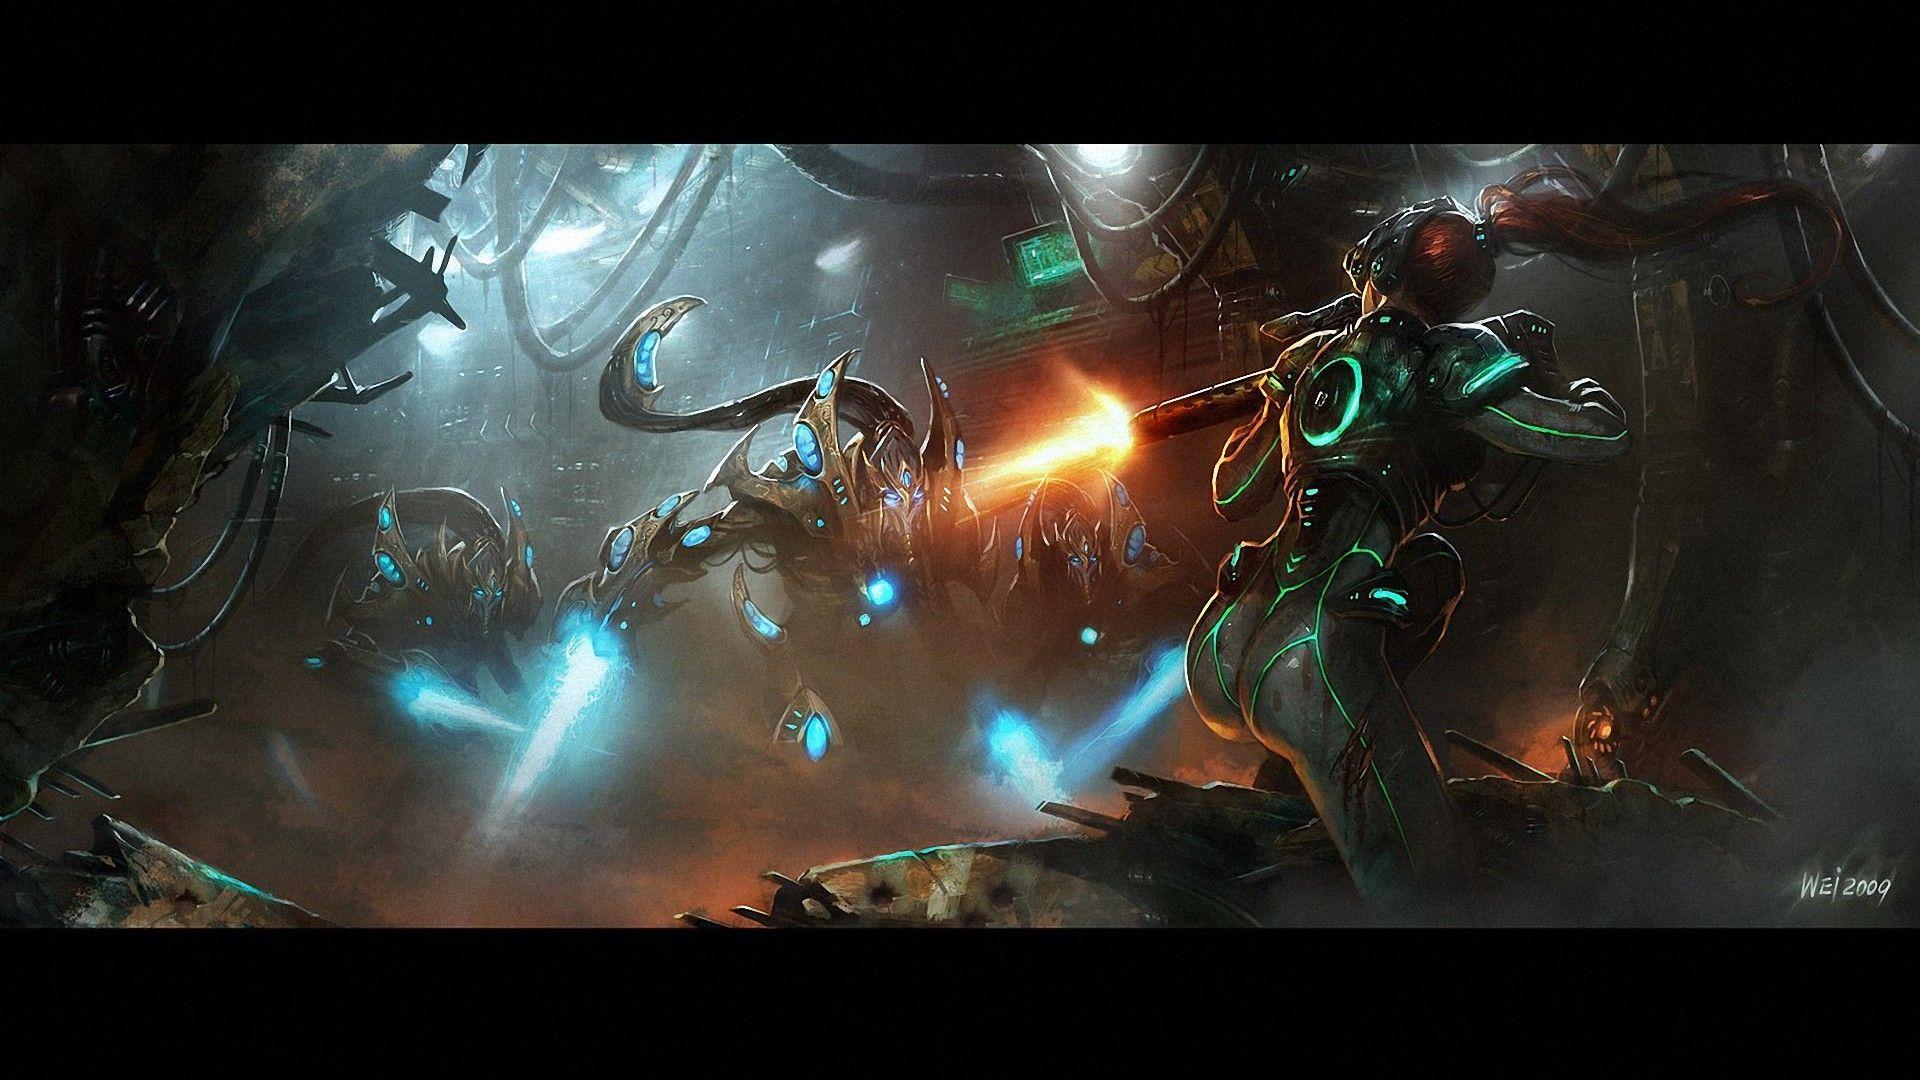 Starcraft kerrigan rule free wallpapers